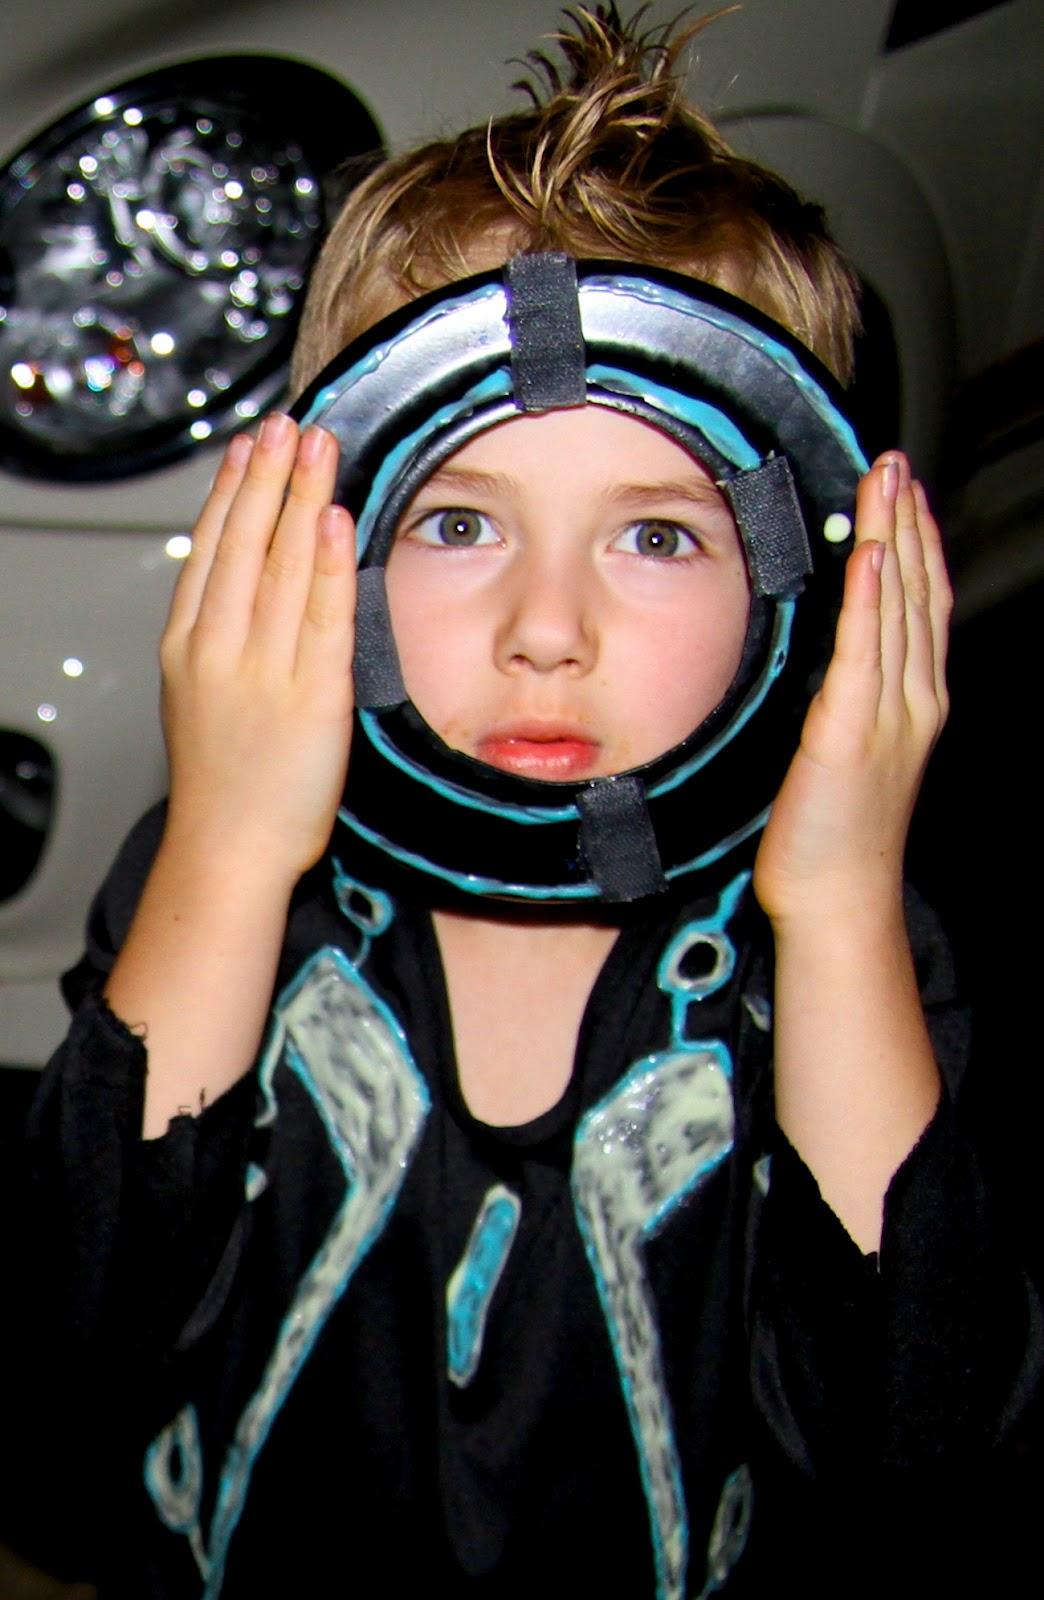 Homemade Tron costume  sc 1 st  Life Sprinkled With Glitter & Life Sprinkled With Glitter: Homemade Tron costume